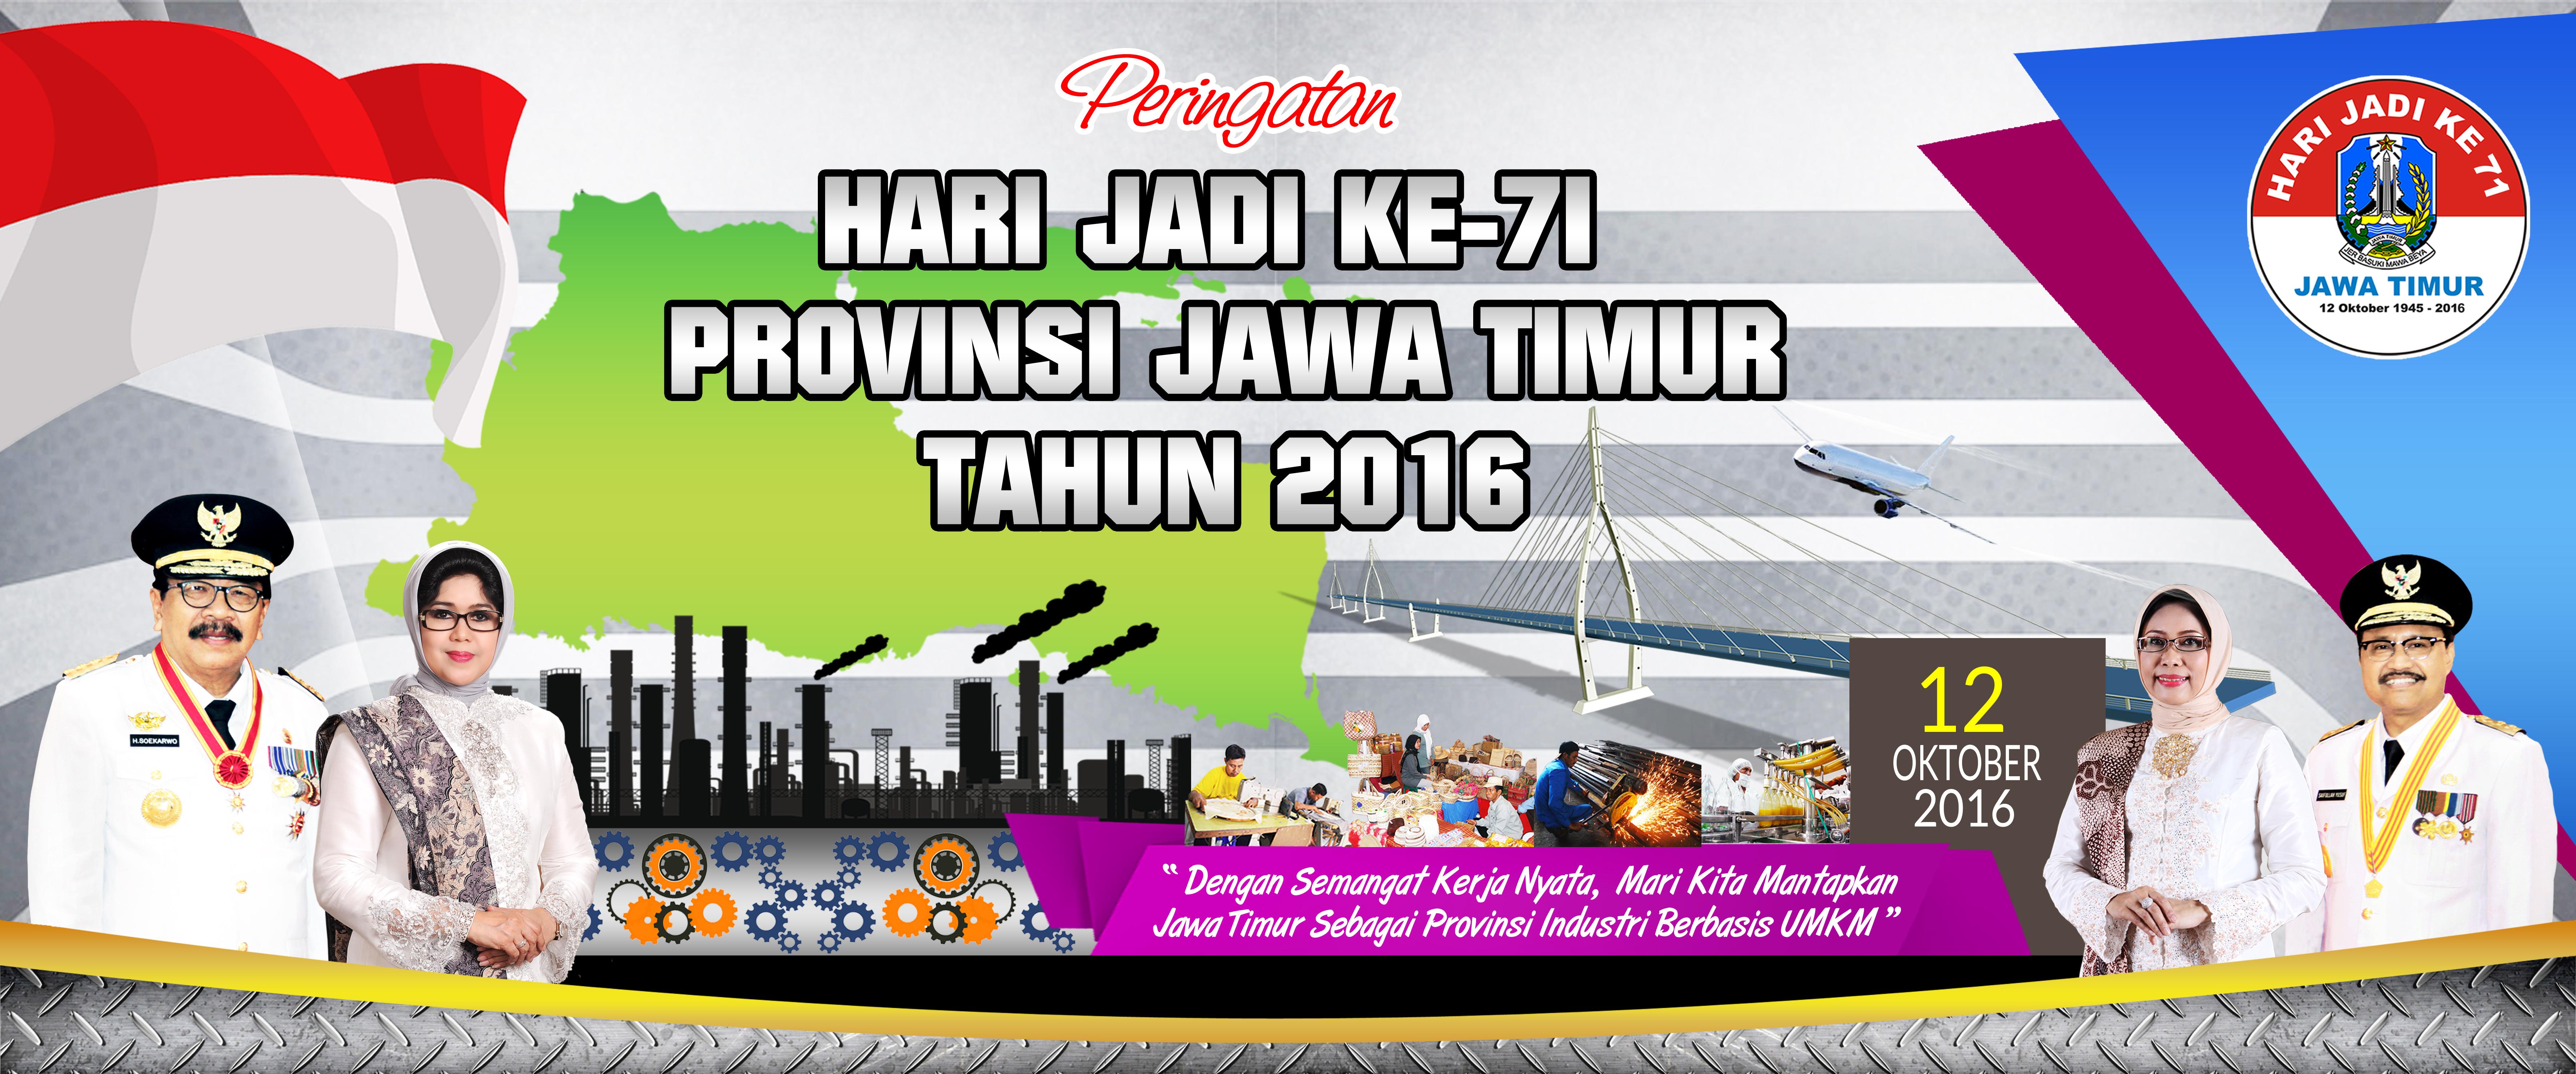 Peringatan Hari Jadi Ke-71 Provinsi Jawa Timur Tahun 2016<BR>Dengan Semangat Kerja Nyata, Mari Kita Mantapkan Jawa Timur Sebagai Provinsi Industri Berbasis UMKM